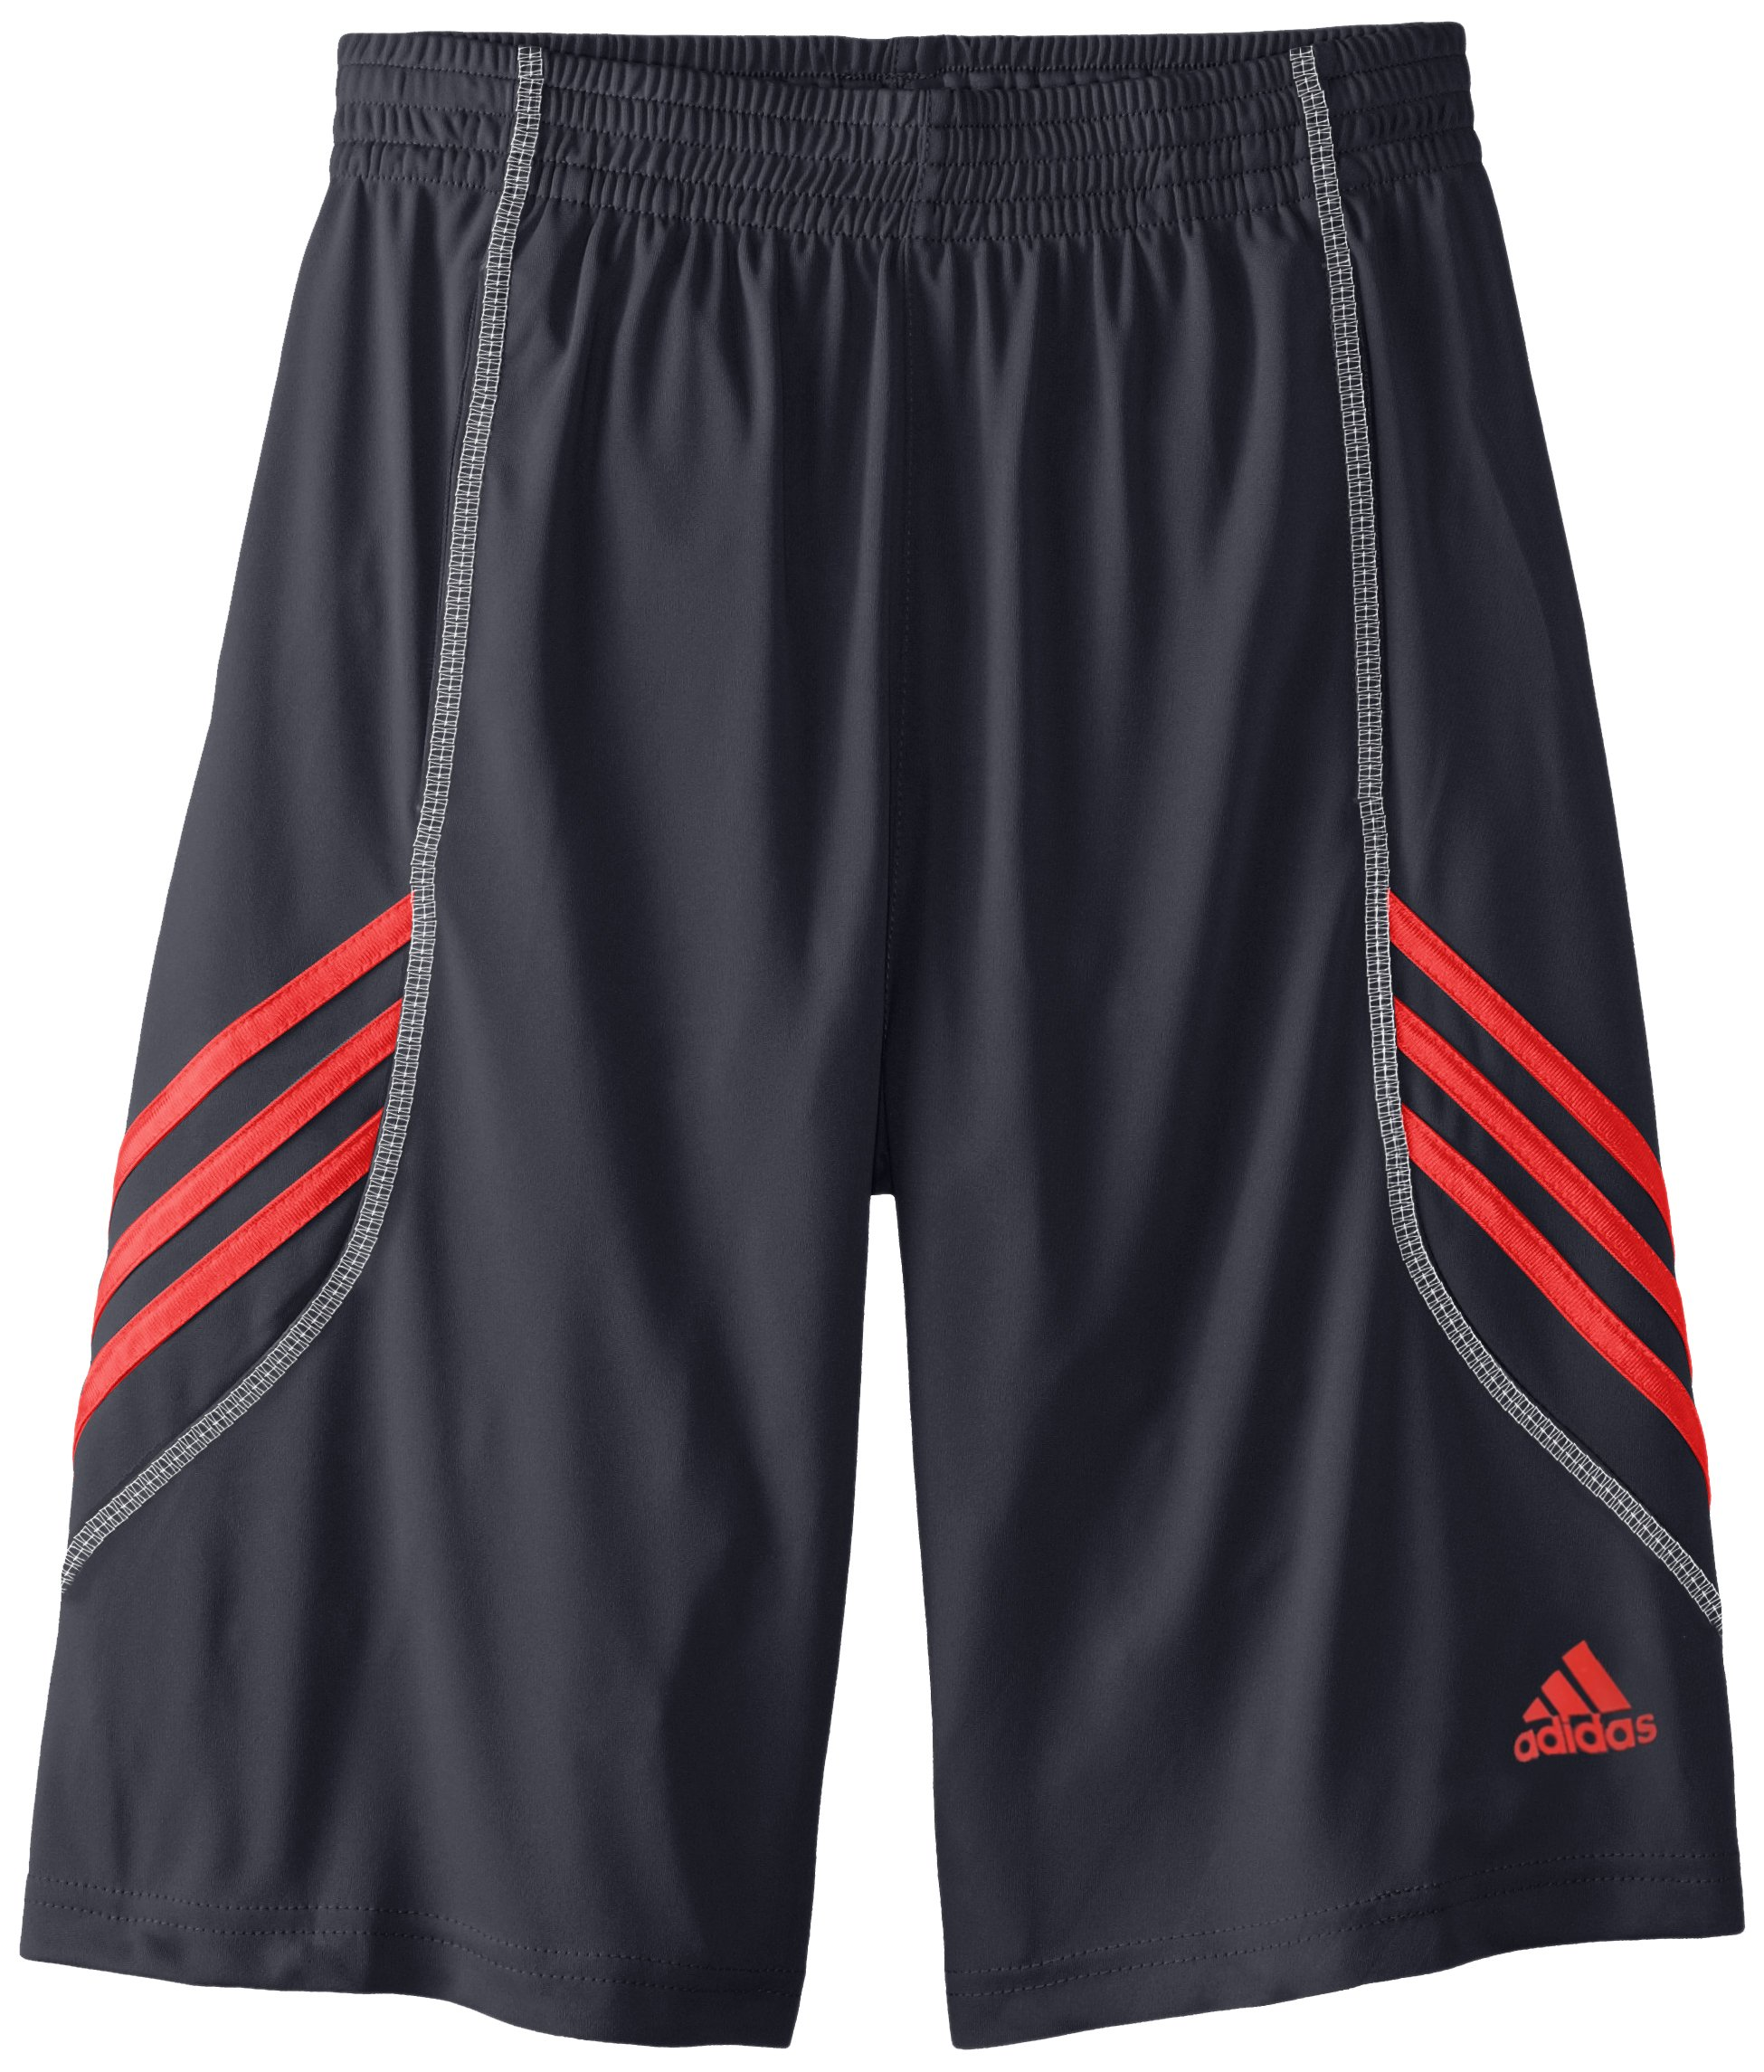 adidas Big Boys' Basics Short, Black/Scarlet, Medium